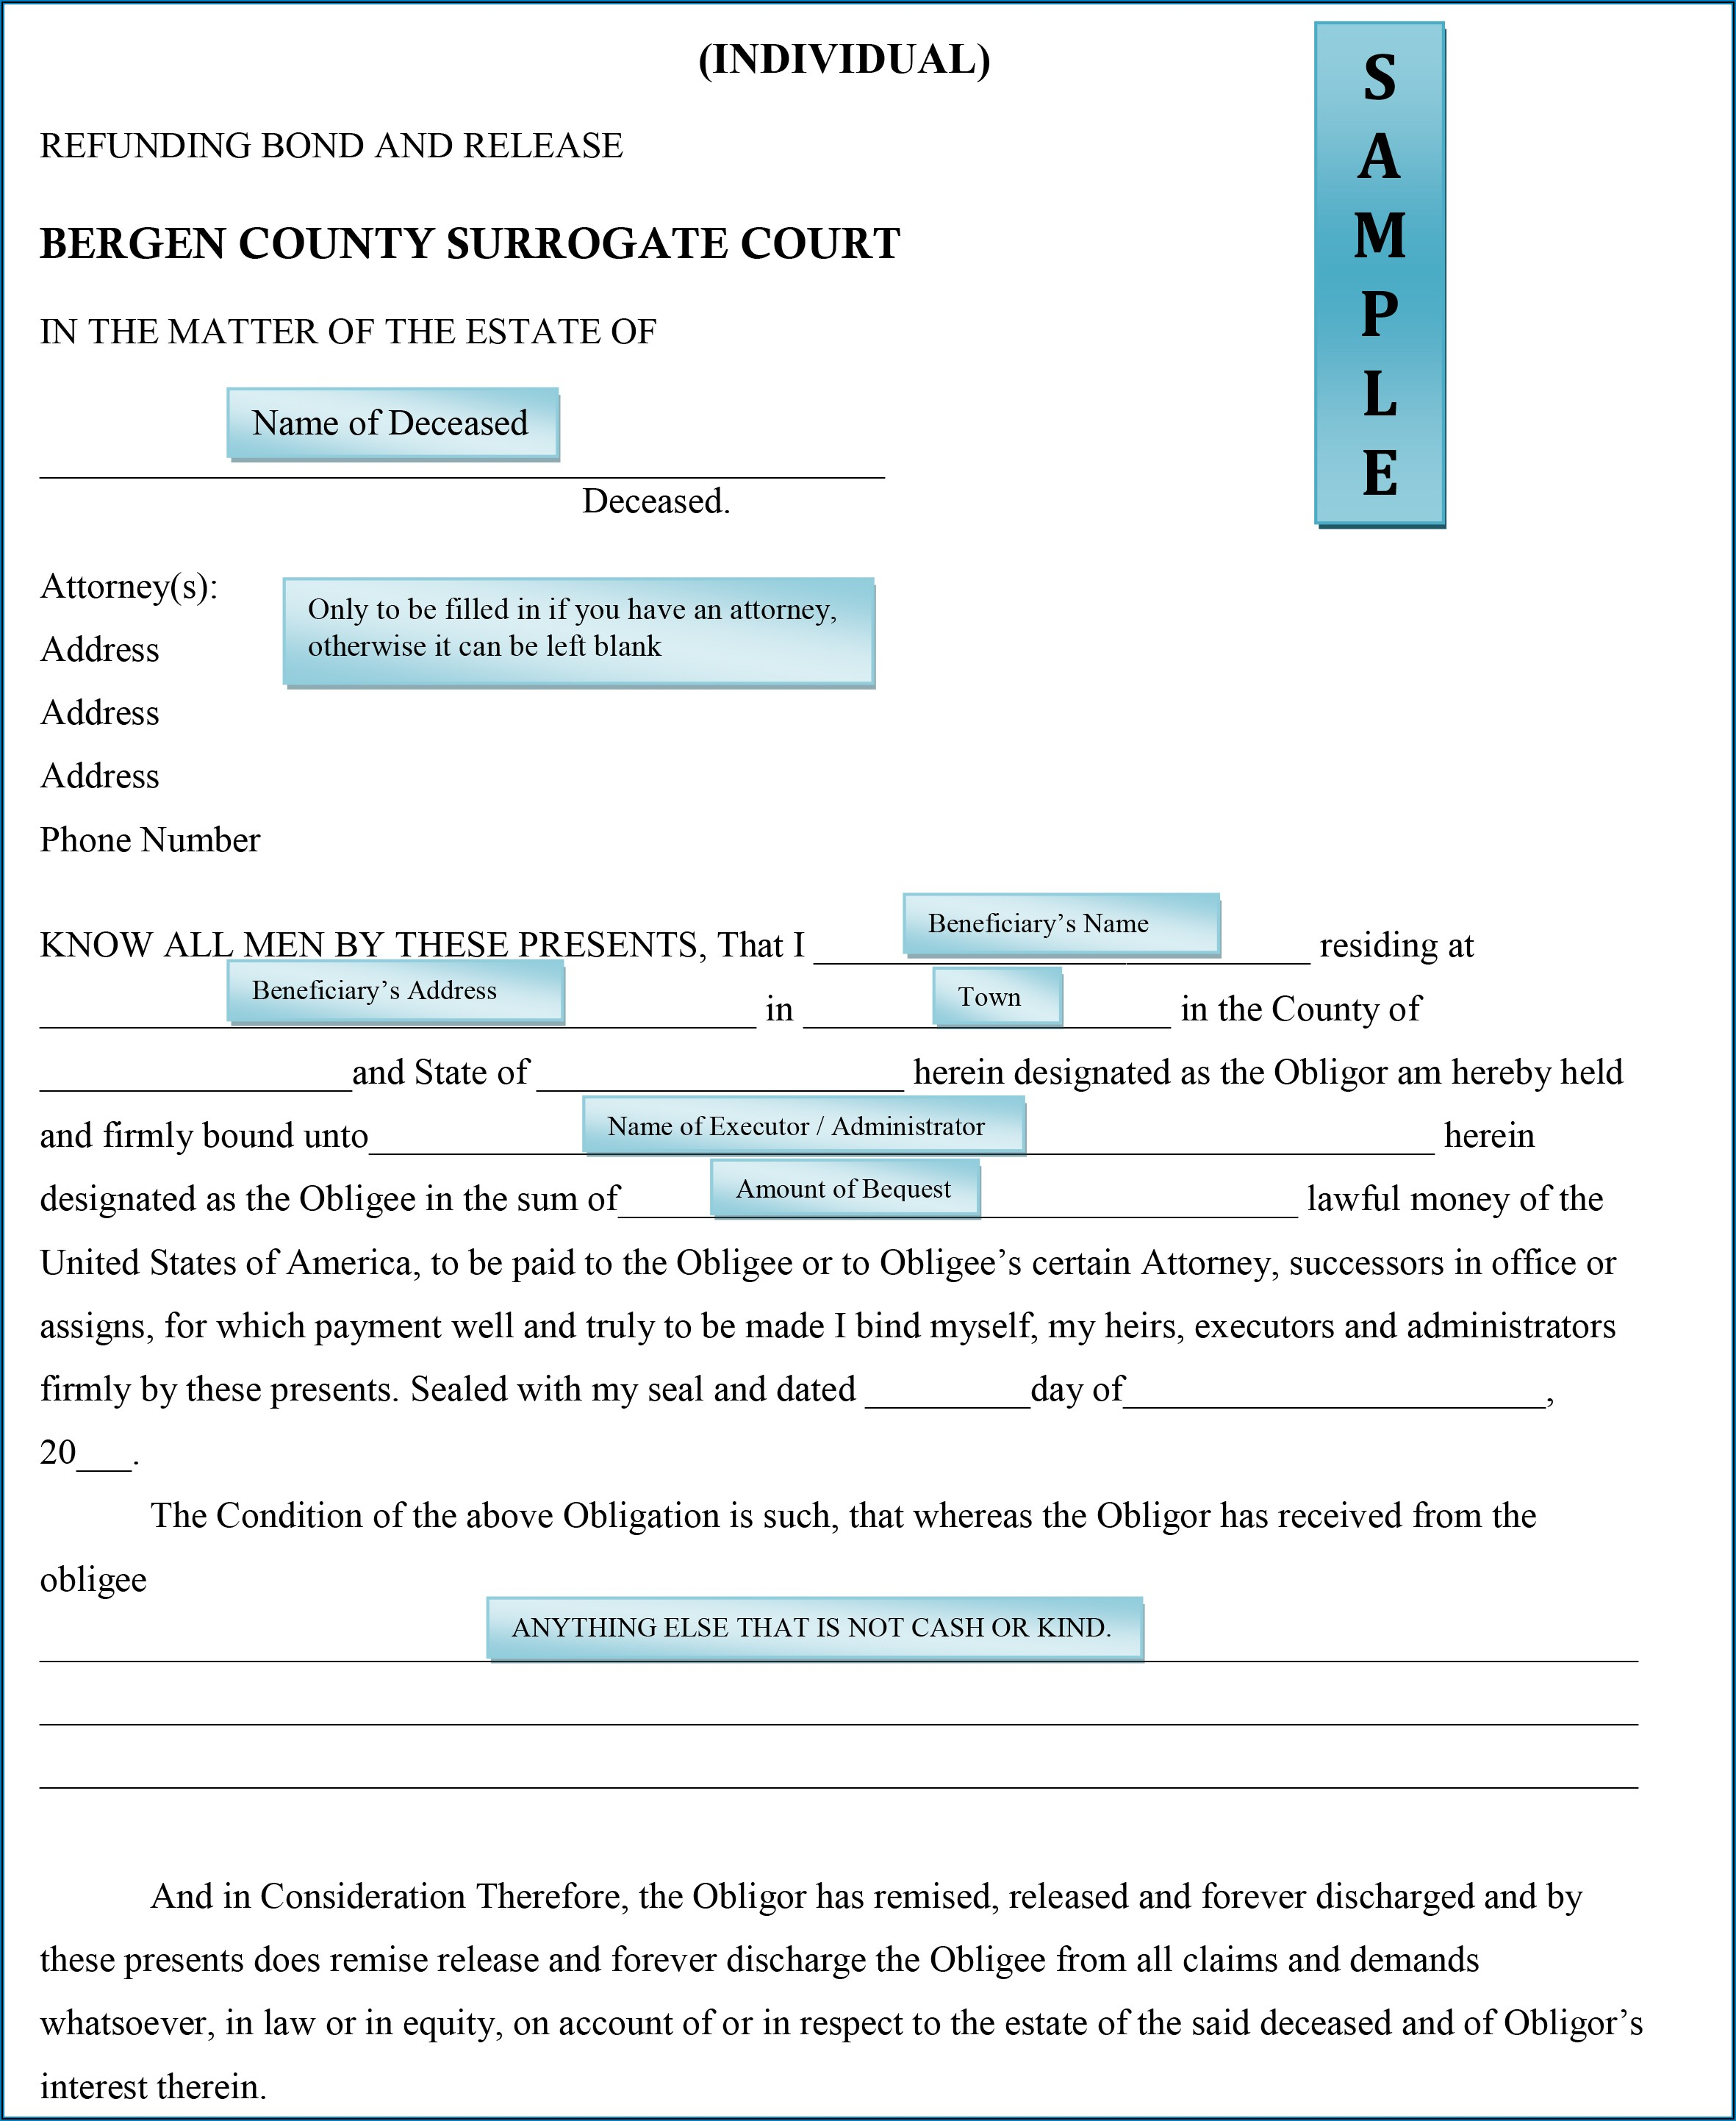 Essex County Surrogate Court Forms